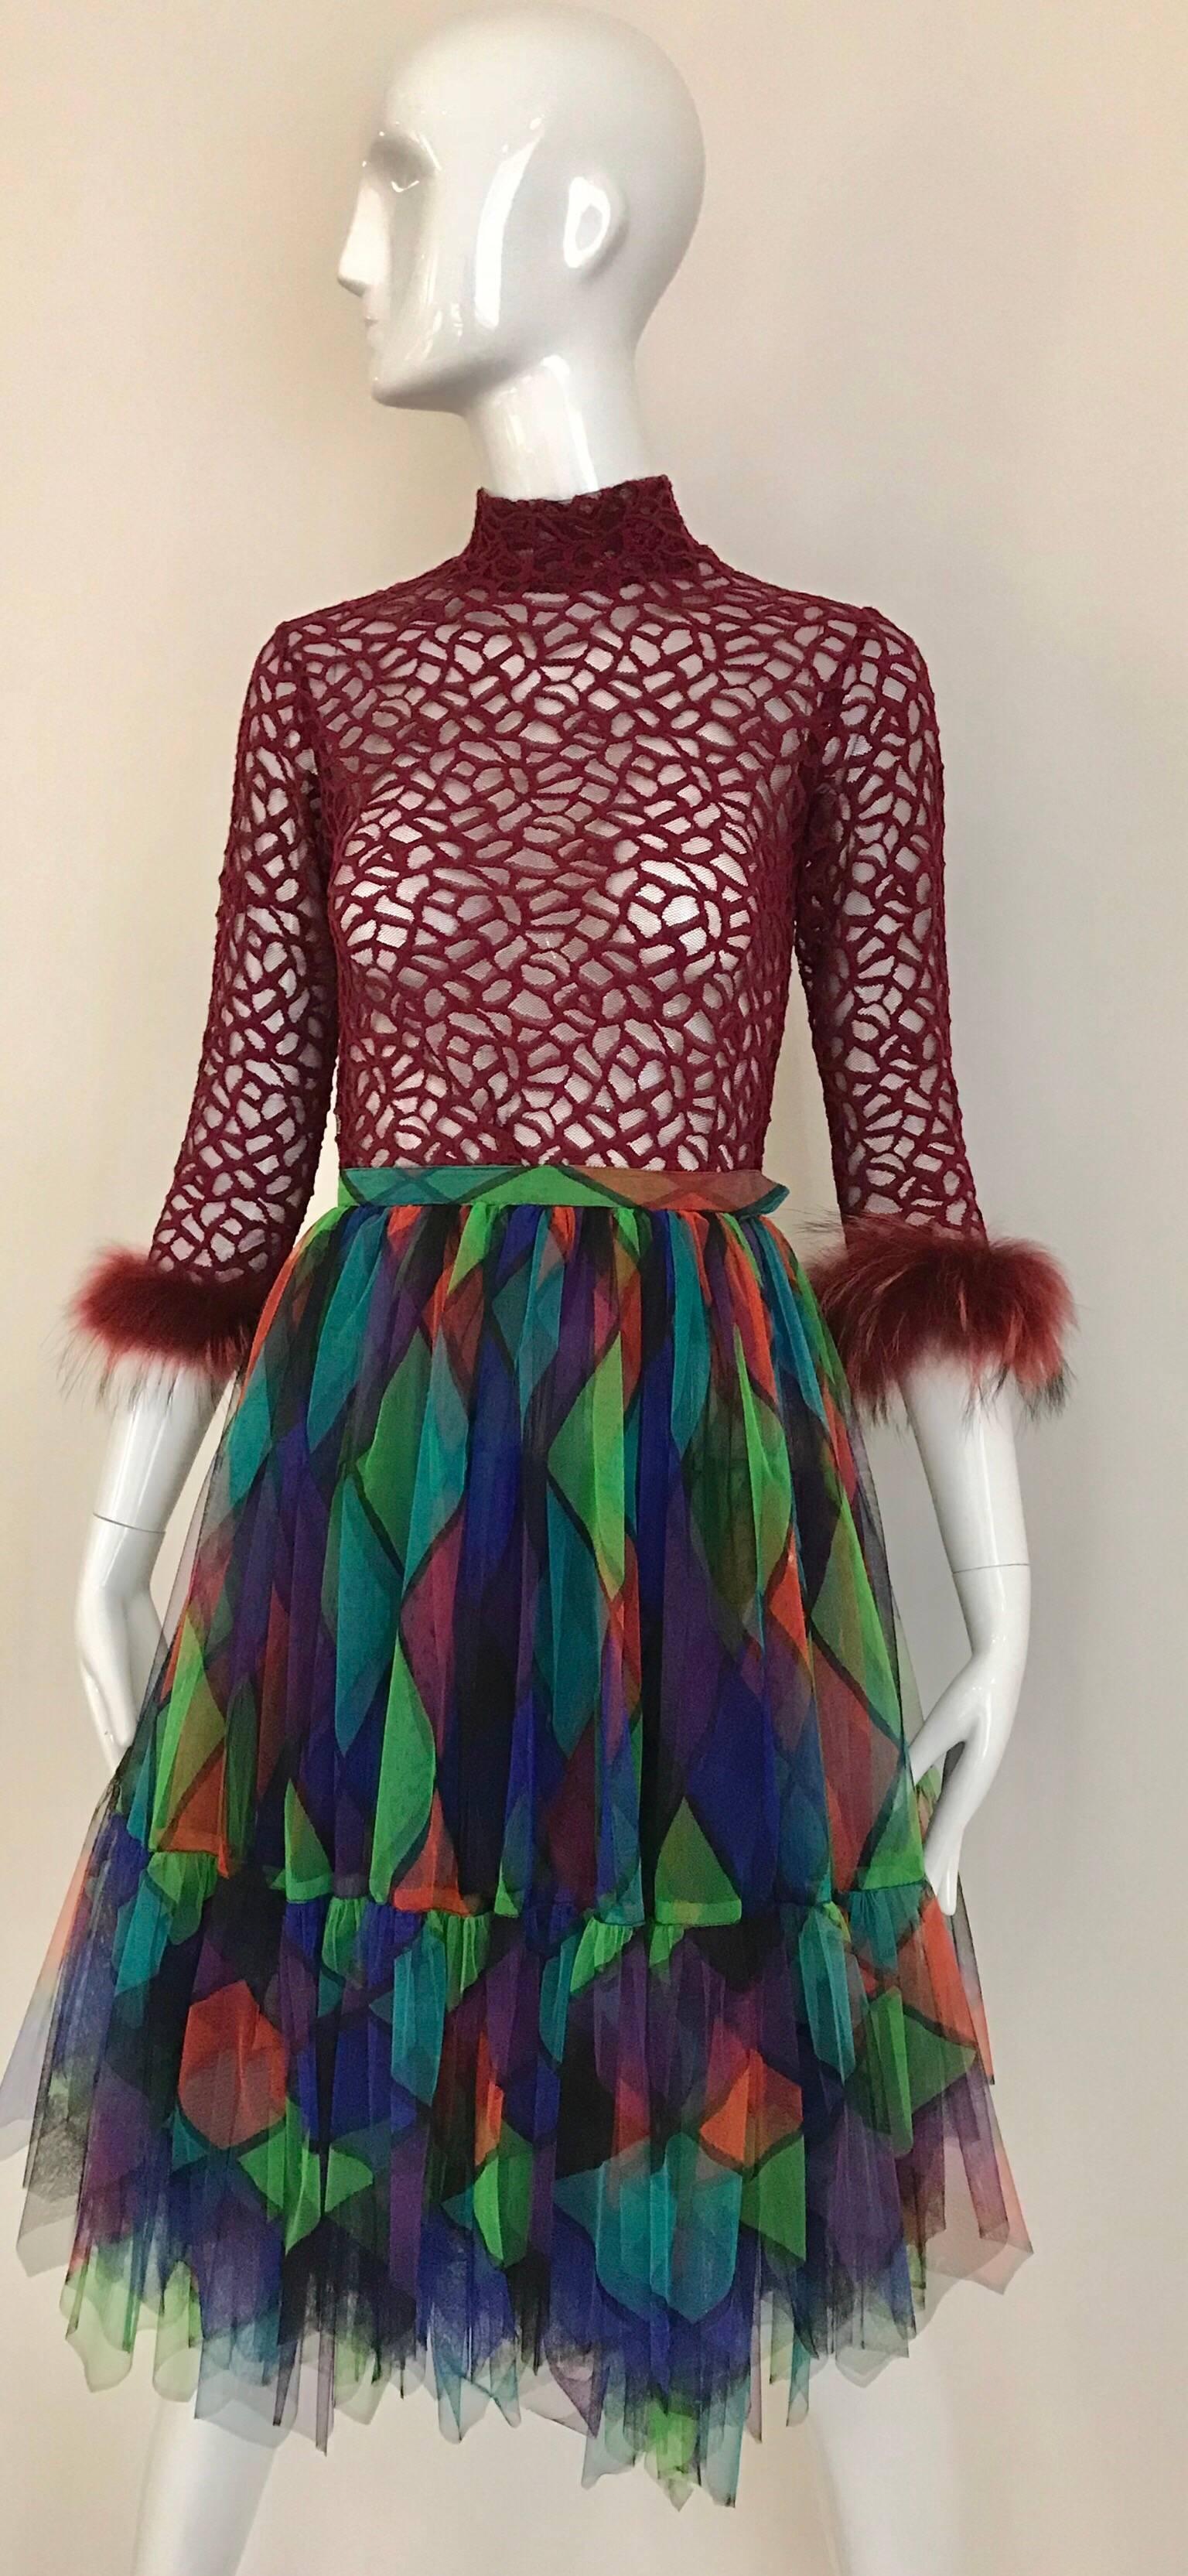 d591fcffa0b0 Vintage Saint Laurent Green and Red Harlequin Print Tulle Skirt For Sale at  1stdibs